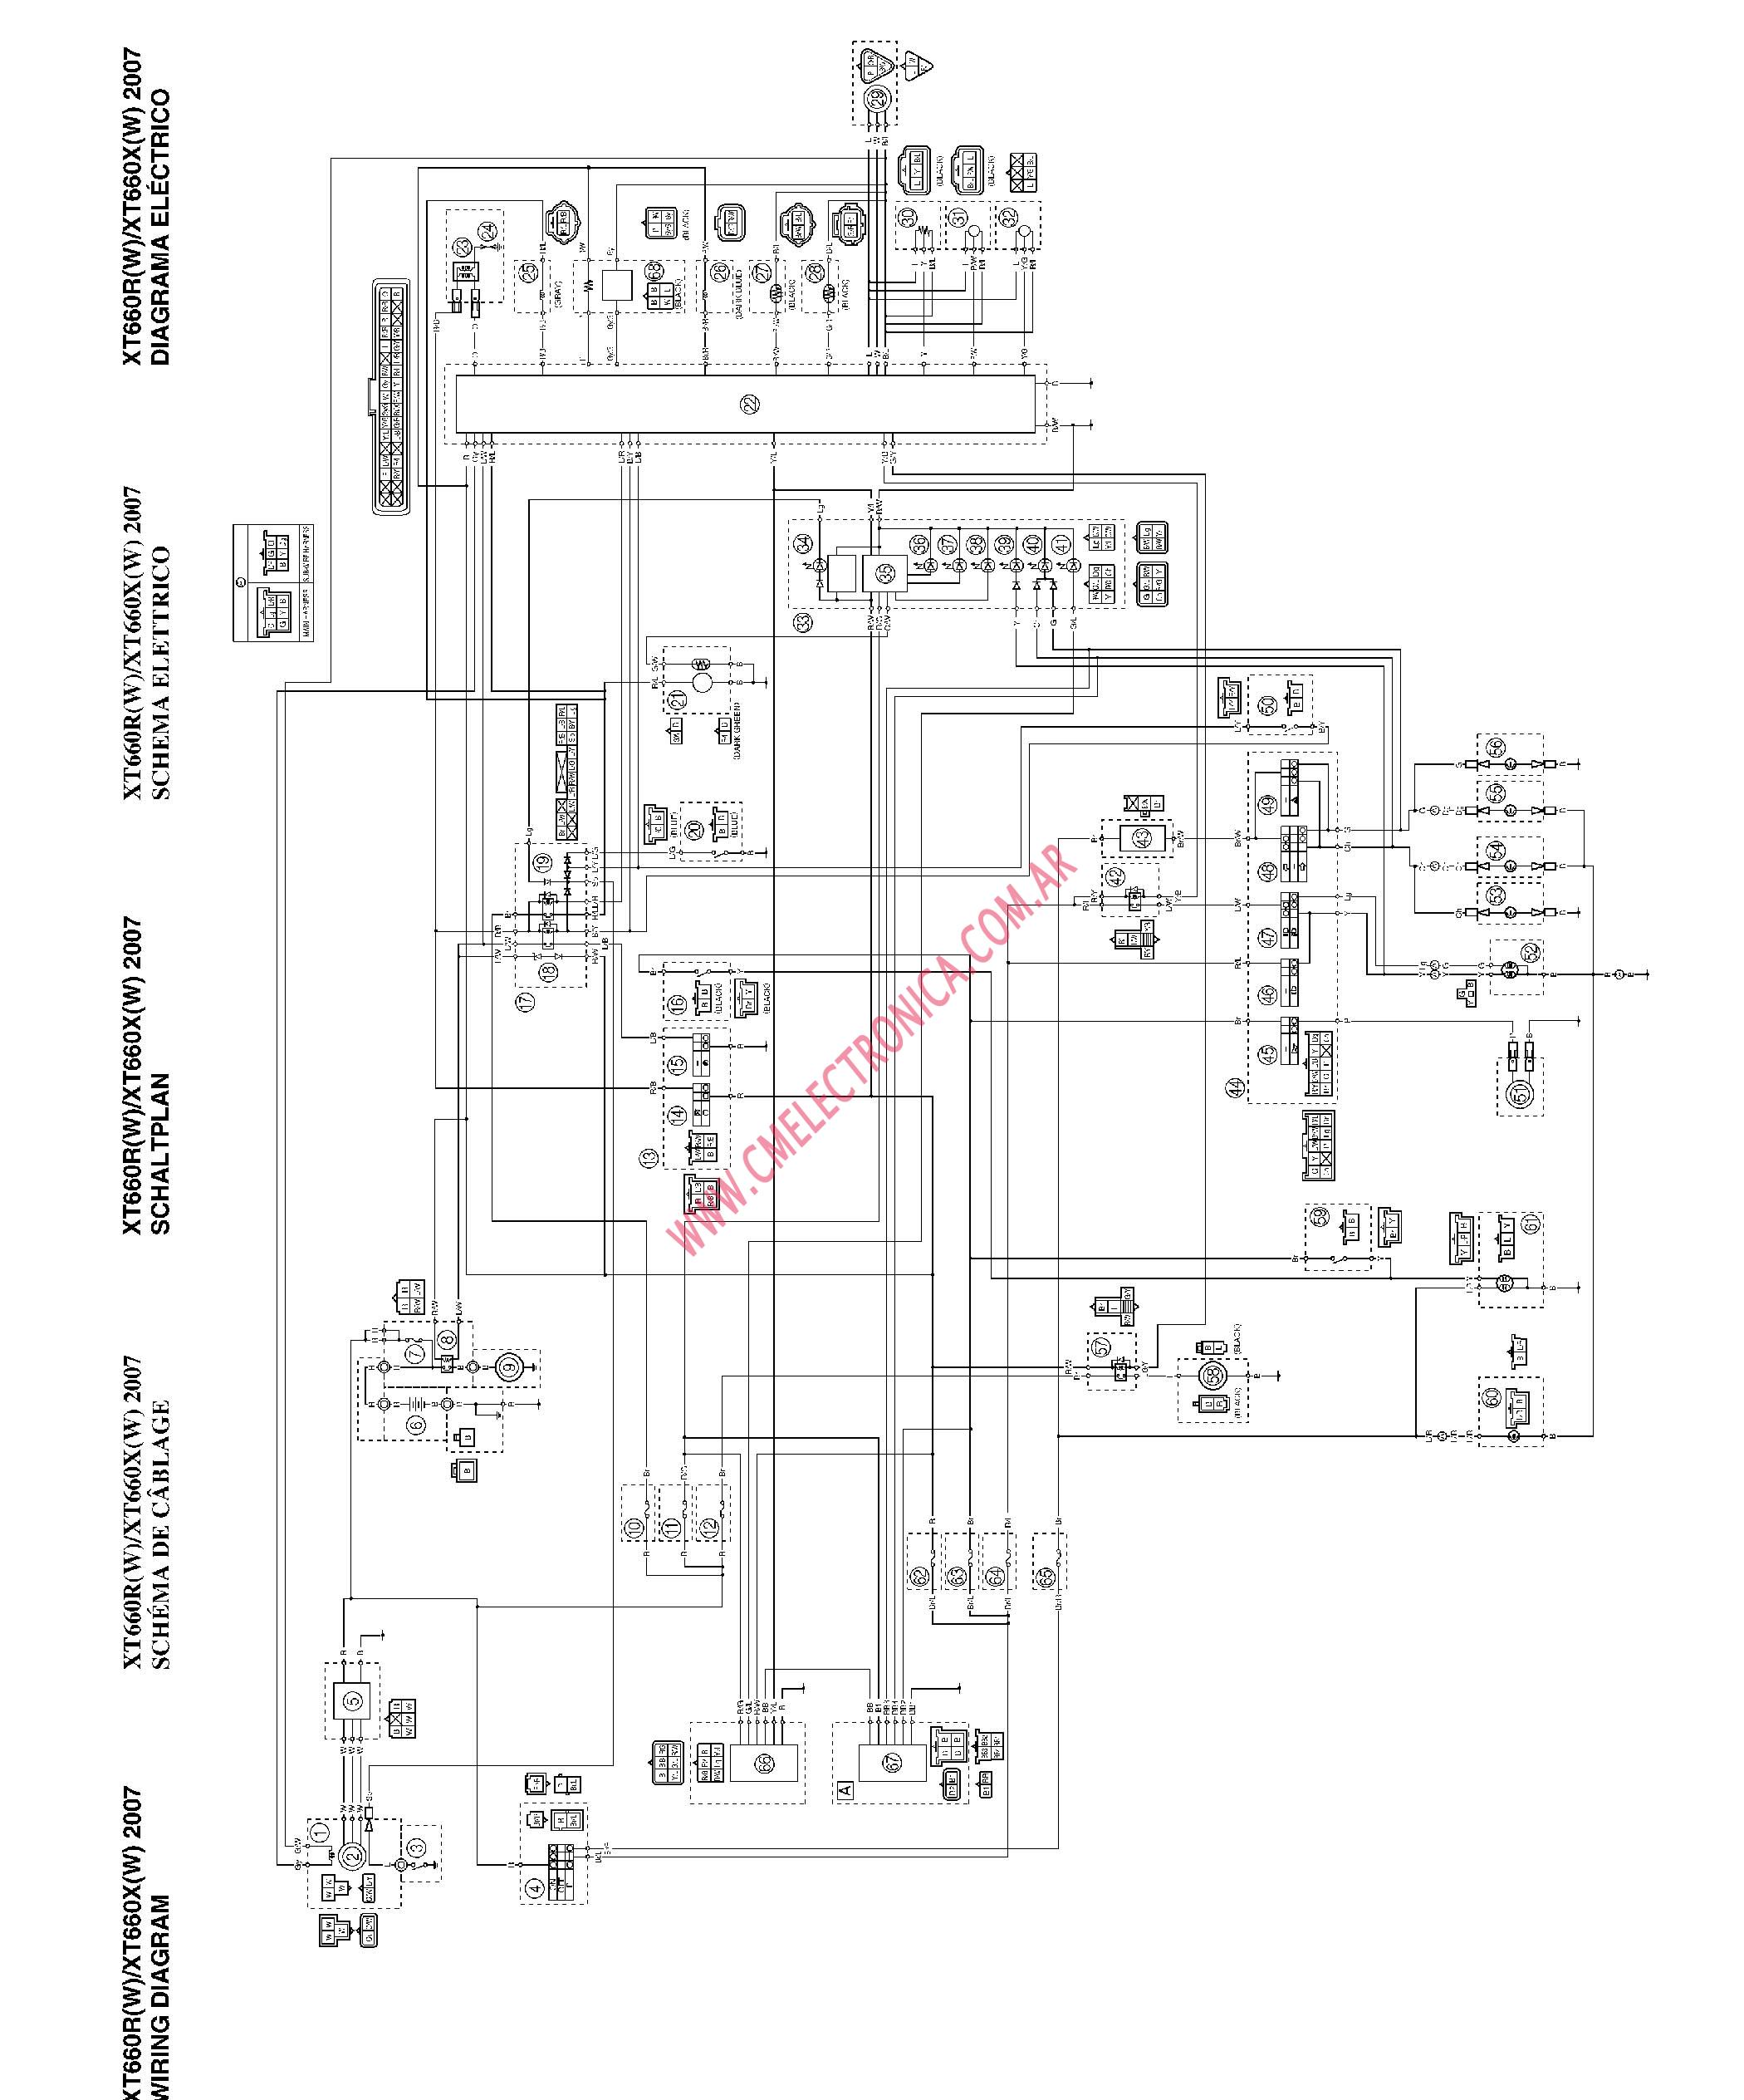 Magnificent suzuki atv wiring diagrams example of asymmetric 2005 suzuki king quad wiring diagram wiring diagrams schematics yamaha xt660r x 2005 suzuki king quad cheapraybanclubmaster Image collections